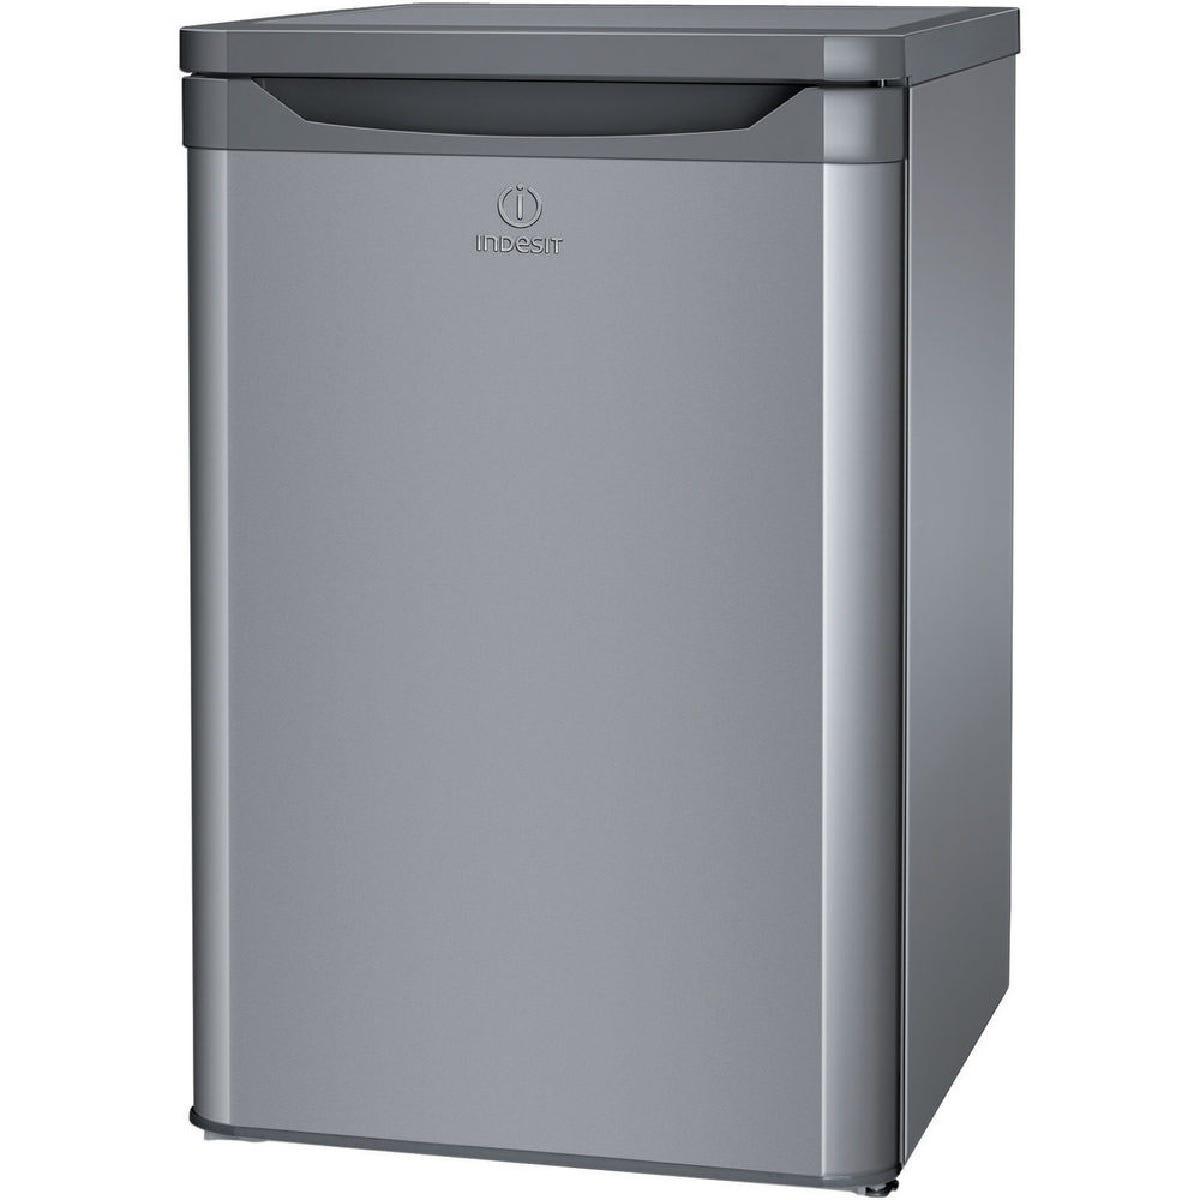 indesit tlaa 10 si.1 fridge - silver